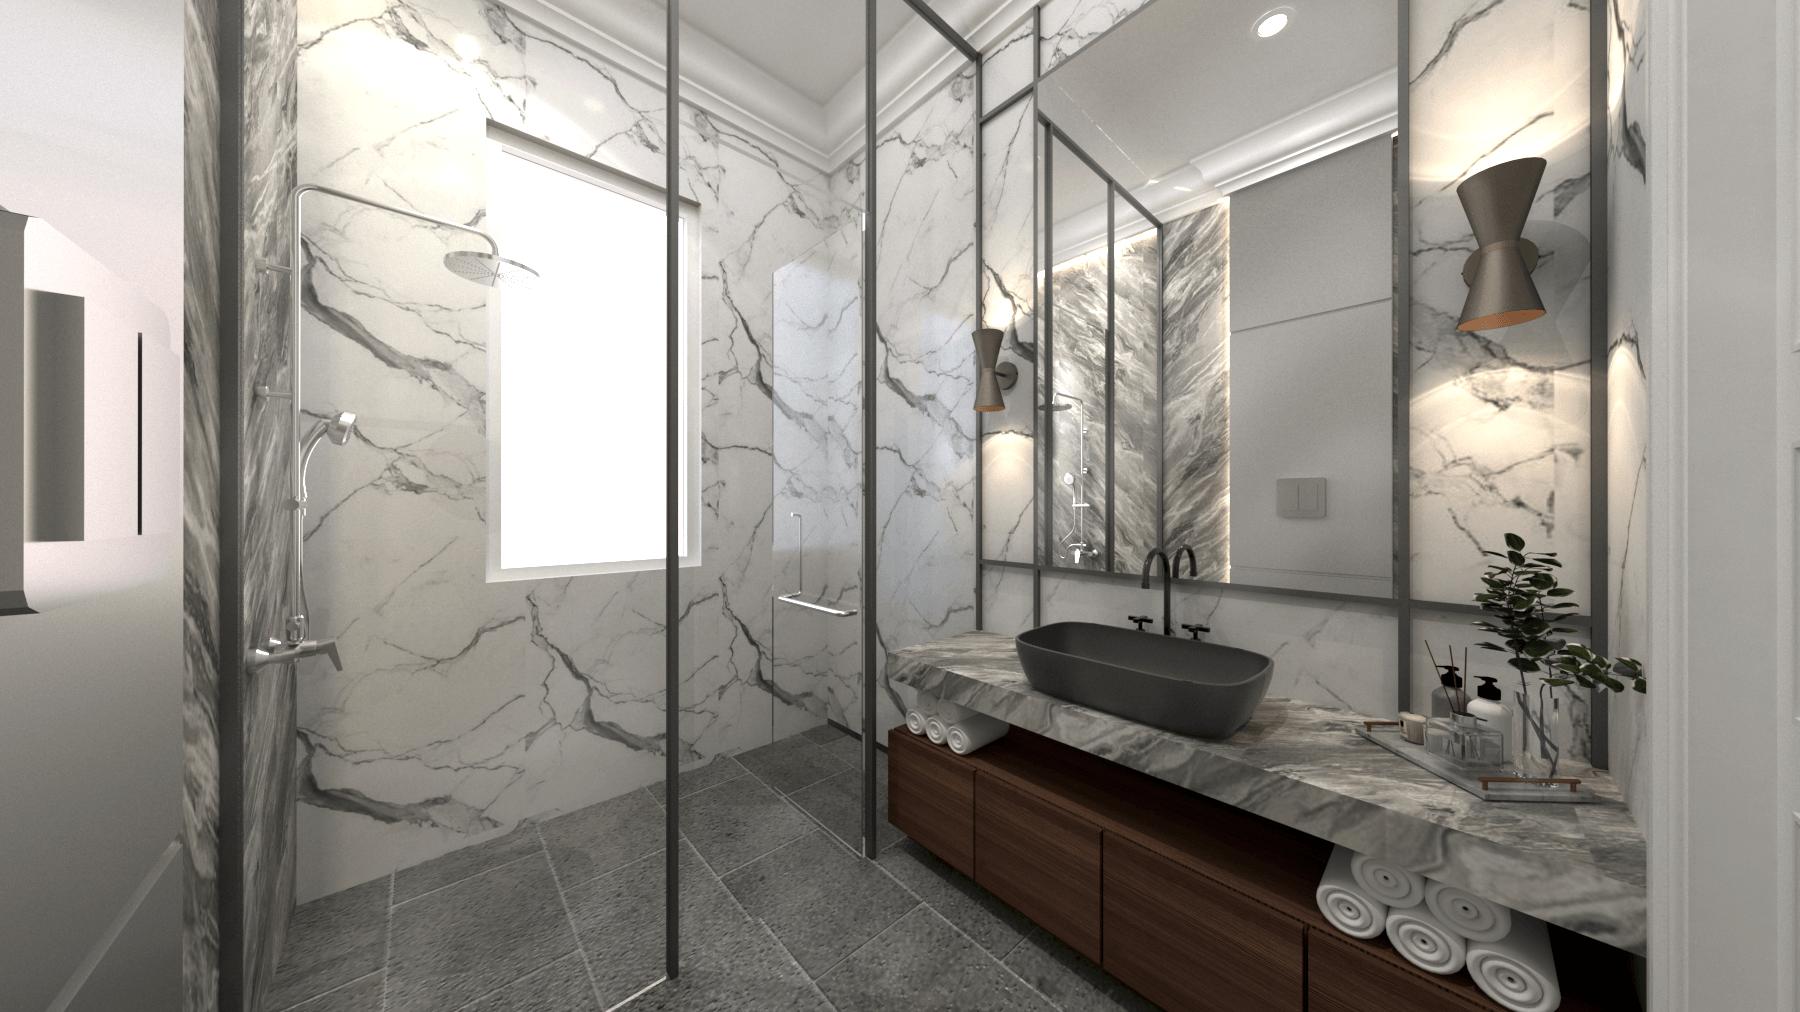 Mimic Concept Mr. Am - 2Nd Floor Jl. Pantai Indah Kapuk, Rt.6/rw.2, Kamal Muara, Kec. Penjaringan, Kota Jkt Utara, Daerah Khusus Ibukota Jakarta, Indonesia Jl. Pantai Indah Kapuk, Rt.6/rw.2, Kamal Muara, Kec. Penjaringan, Kota Jkt Utara, Daerah Khusus Ibukota Jakarta, Indonesia Bathroom Kid View 1  <P>Theme : Luxury Modern</p> <P>Material : Marble + Hpl&nbsp; + Ducco&nbsp;</p> 92600